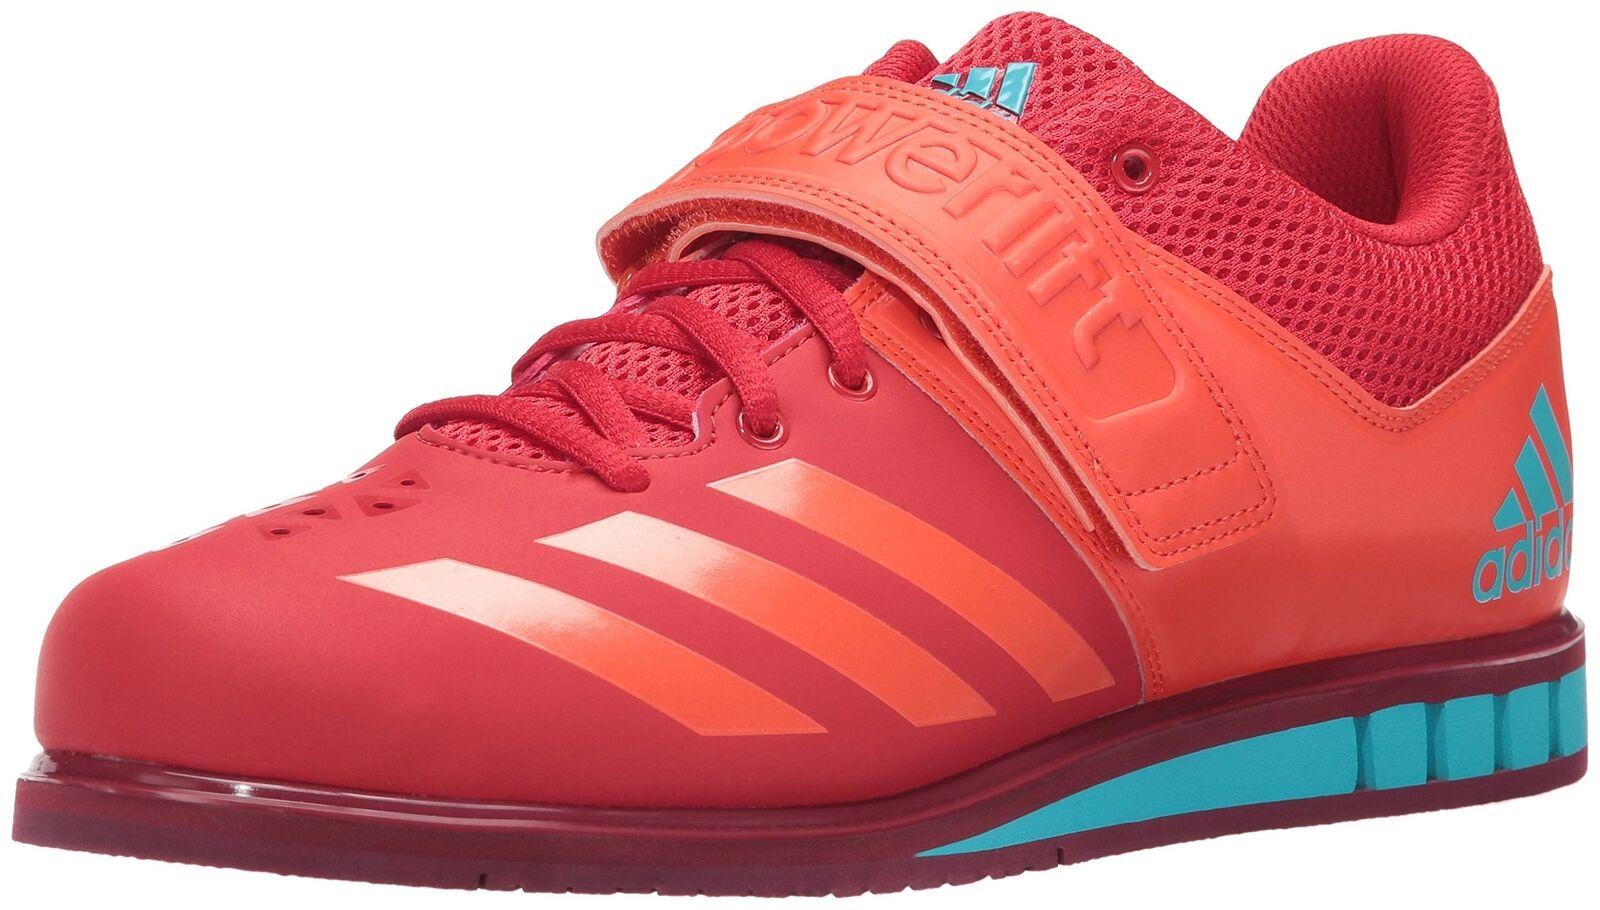 Adidas Men's Powerlift.3.1 Cross Trainer Scarlet Energy Collegiate Burgundy New